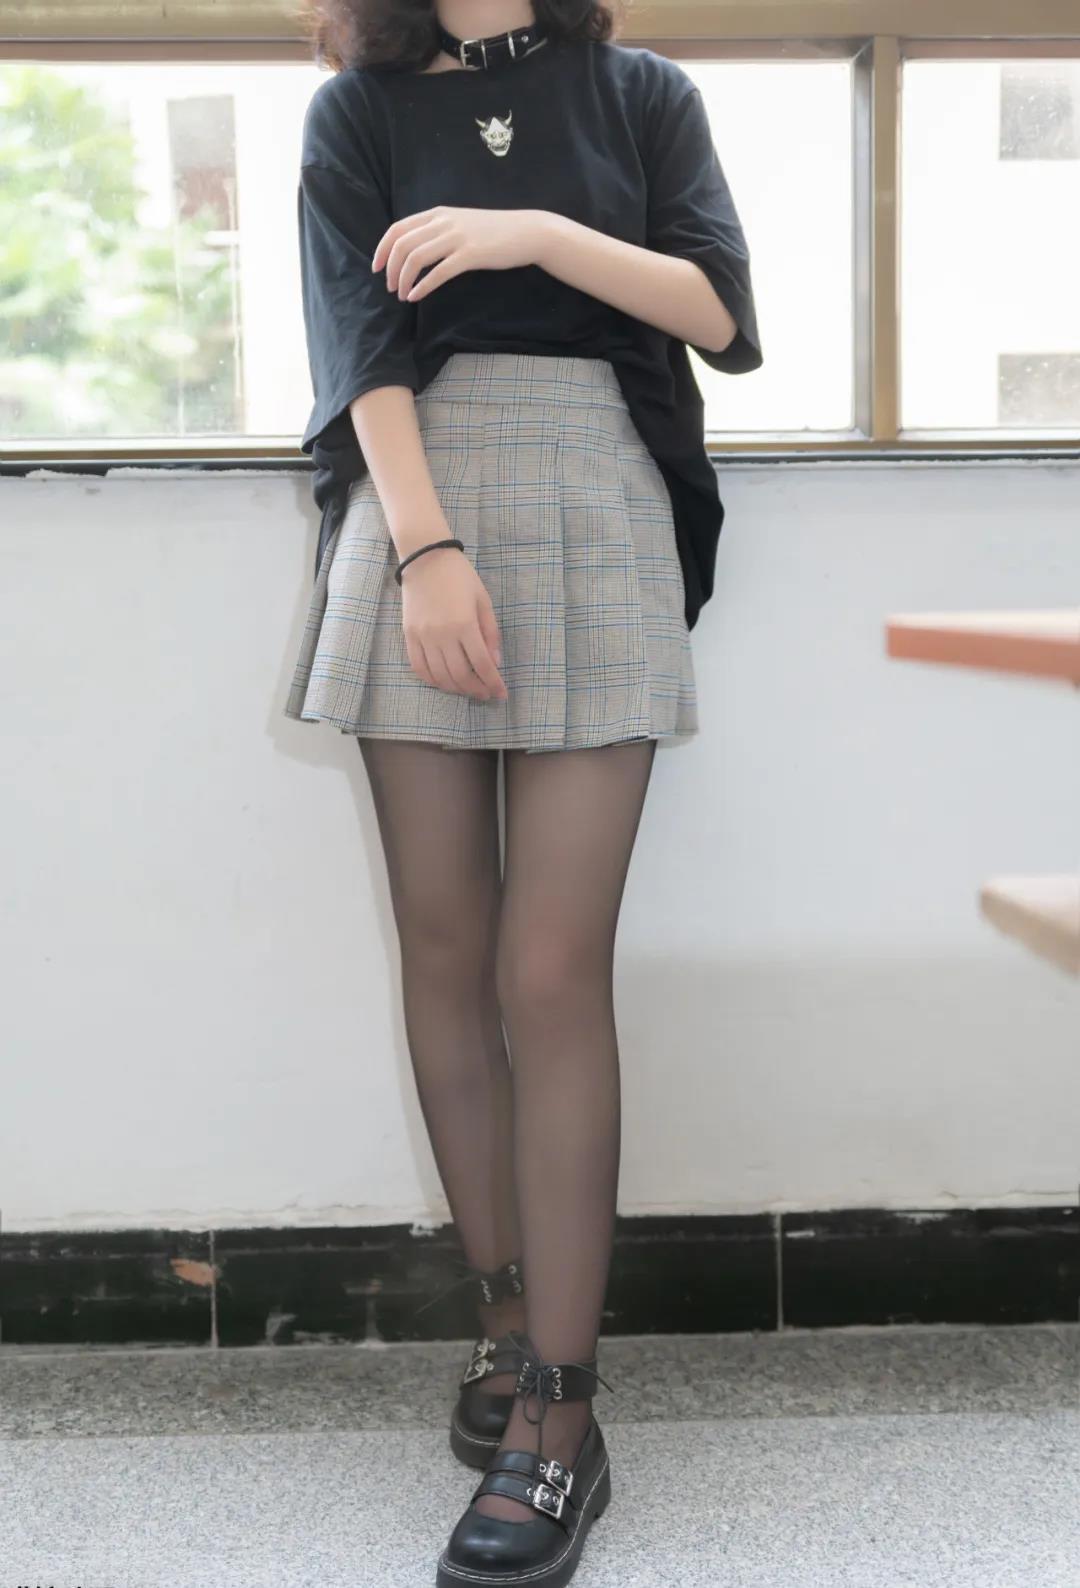 【COSPLAY美女】JK制服下的黑色丝袜美腿 喵糖映画 VOL.093 丝袜酷女孩 [41P-383MB]